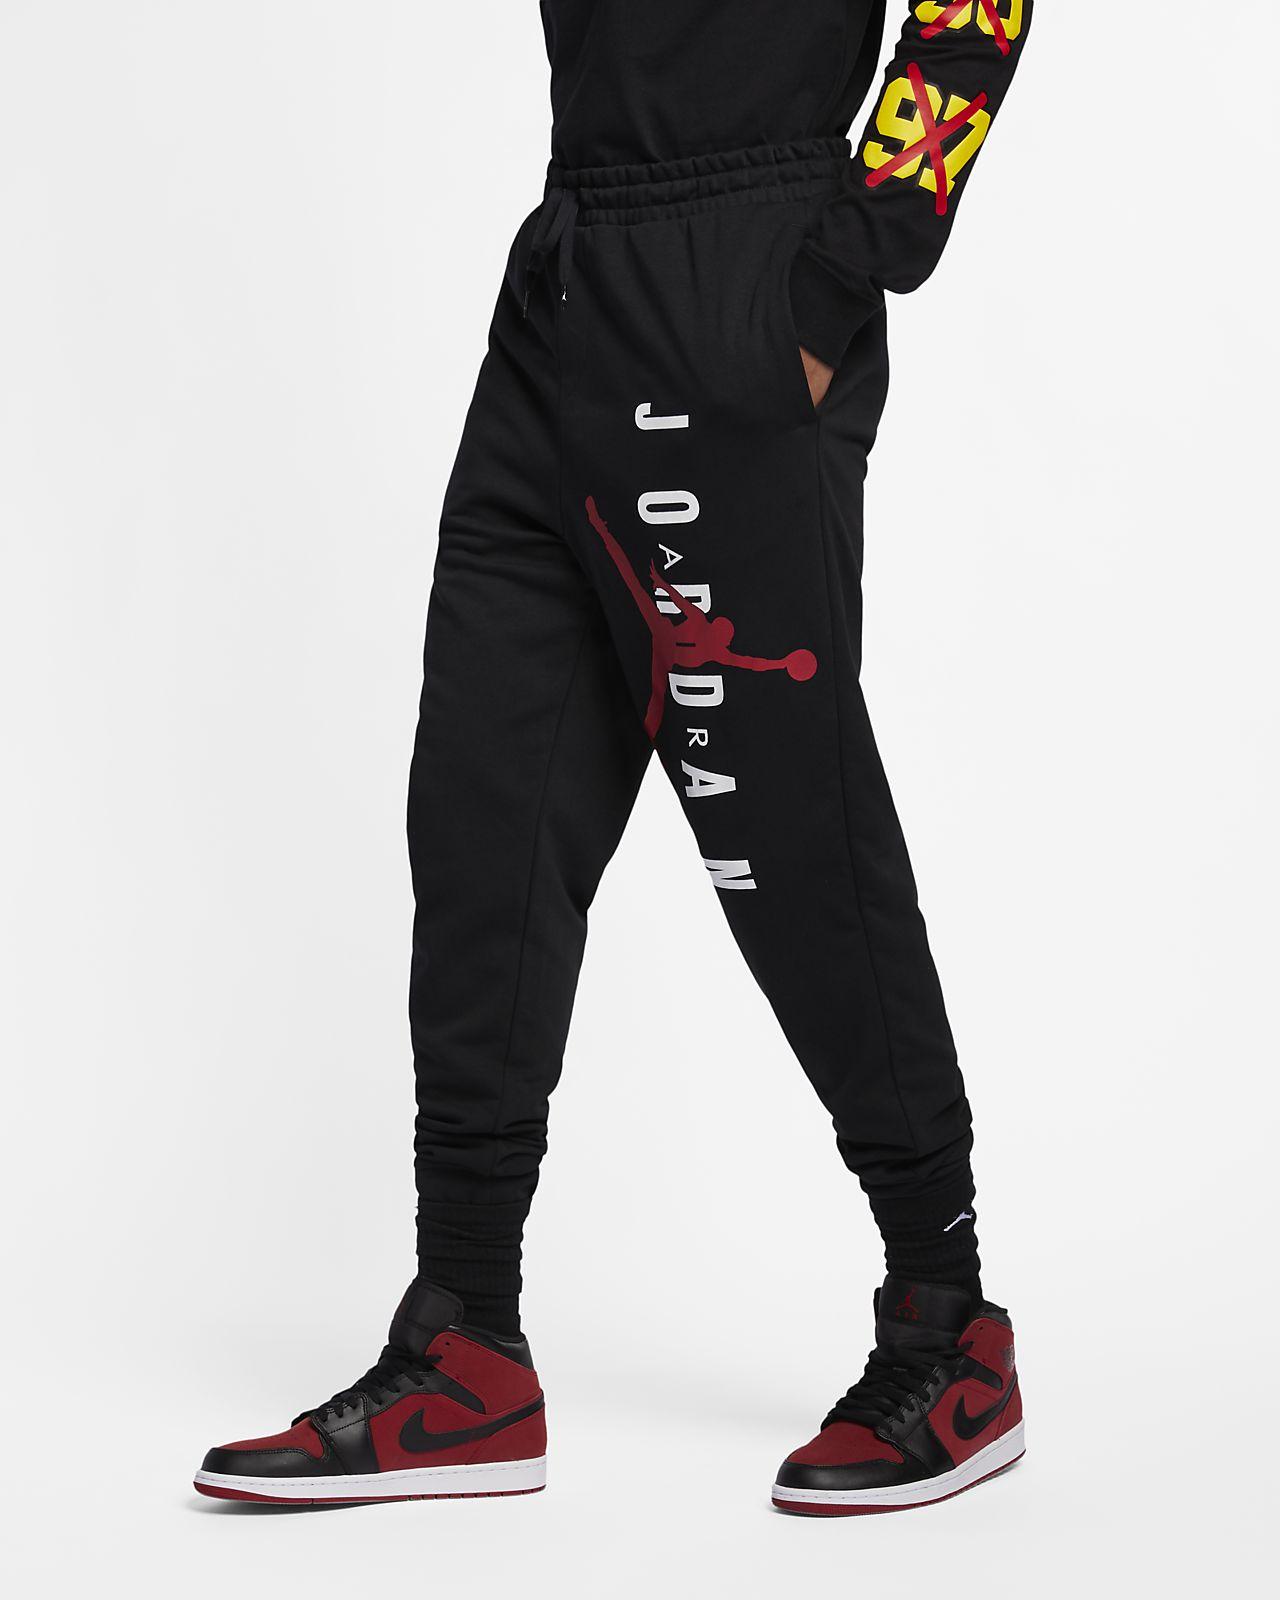 Jordan Jumpman Air Pantalón ligero de tejido Fleece - Hombre